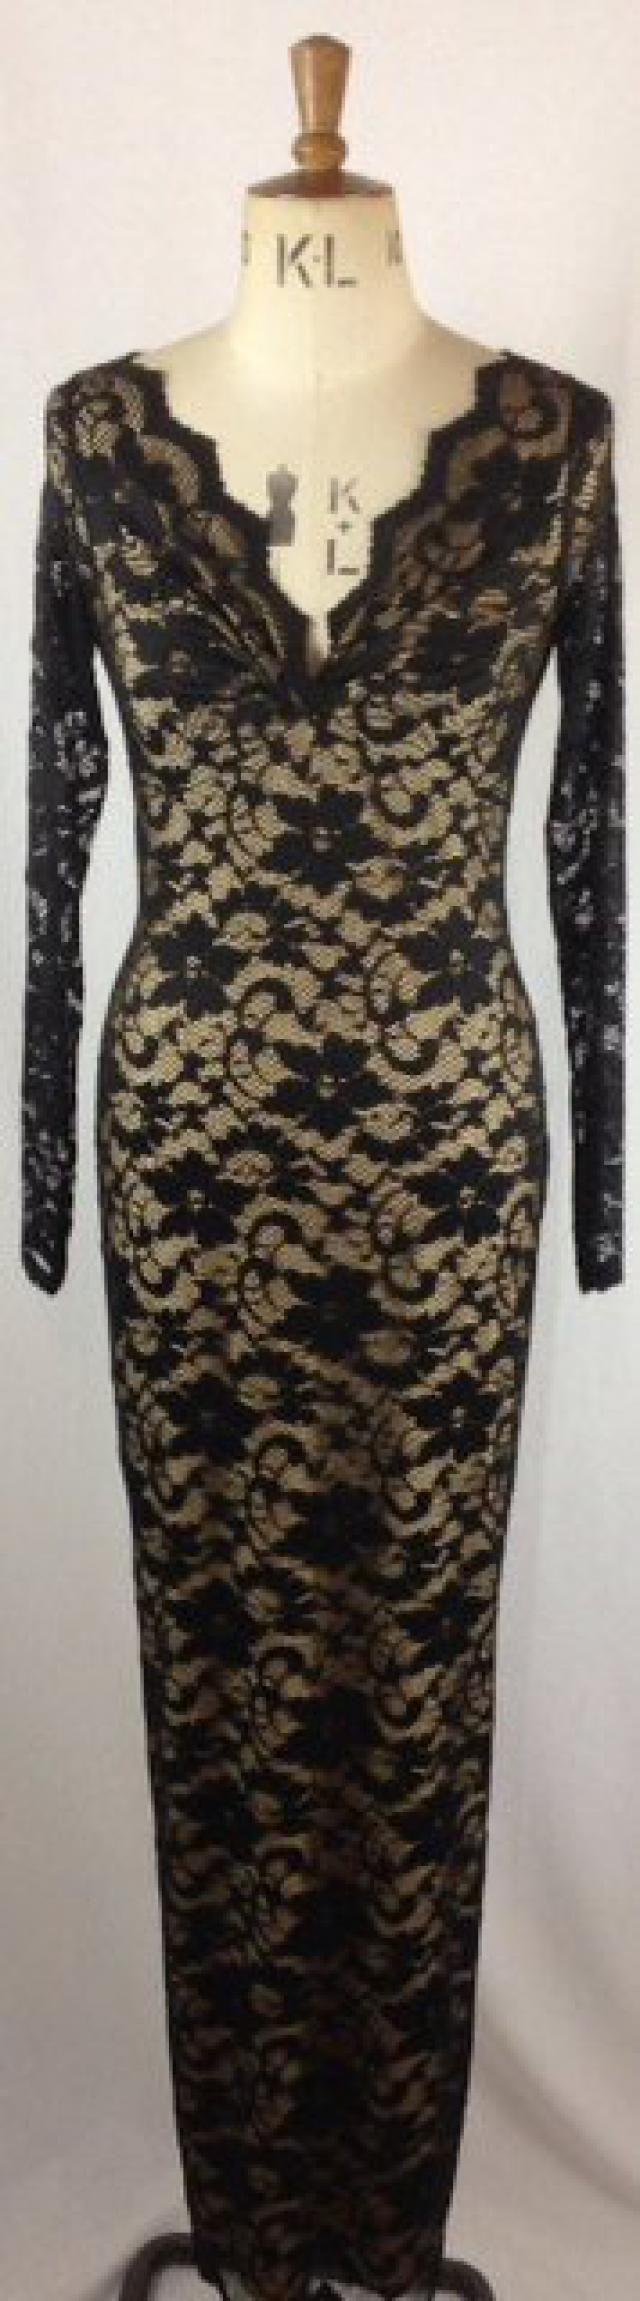 c696c6b972 Baylis   Knight Black Nude Maxi LACE Long Sleeve POLLY Twist Pencil Wiggle  Dress Burlesque Dita